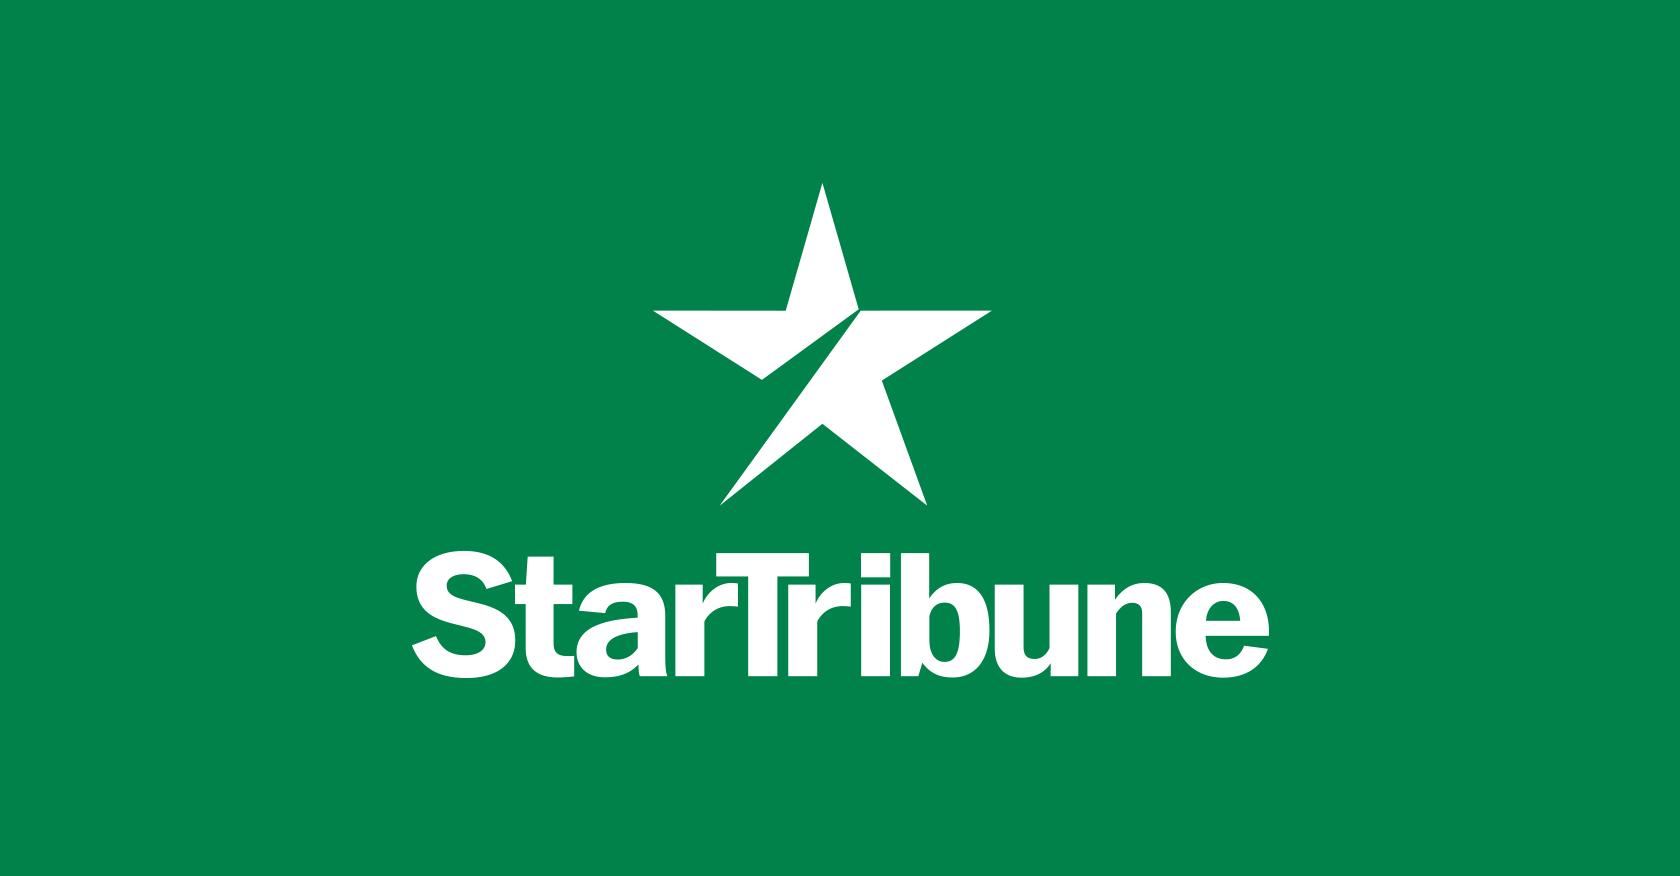 Minnesota Vikings - StarTribune.com